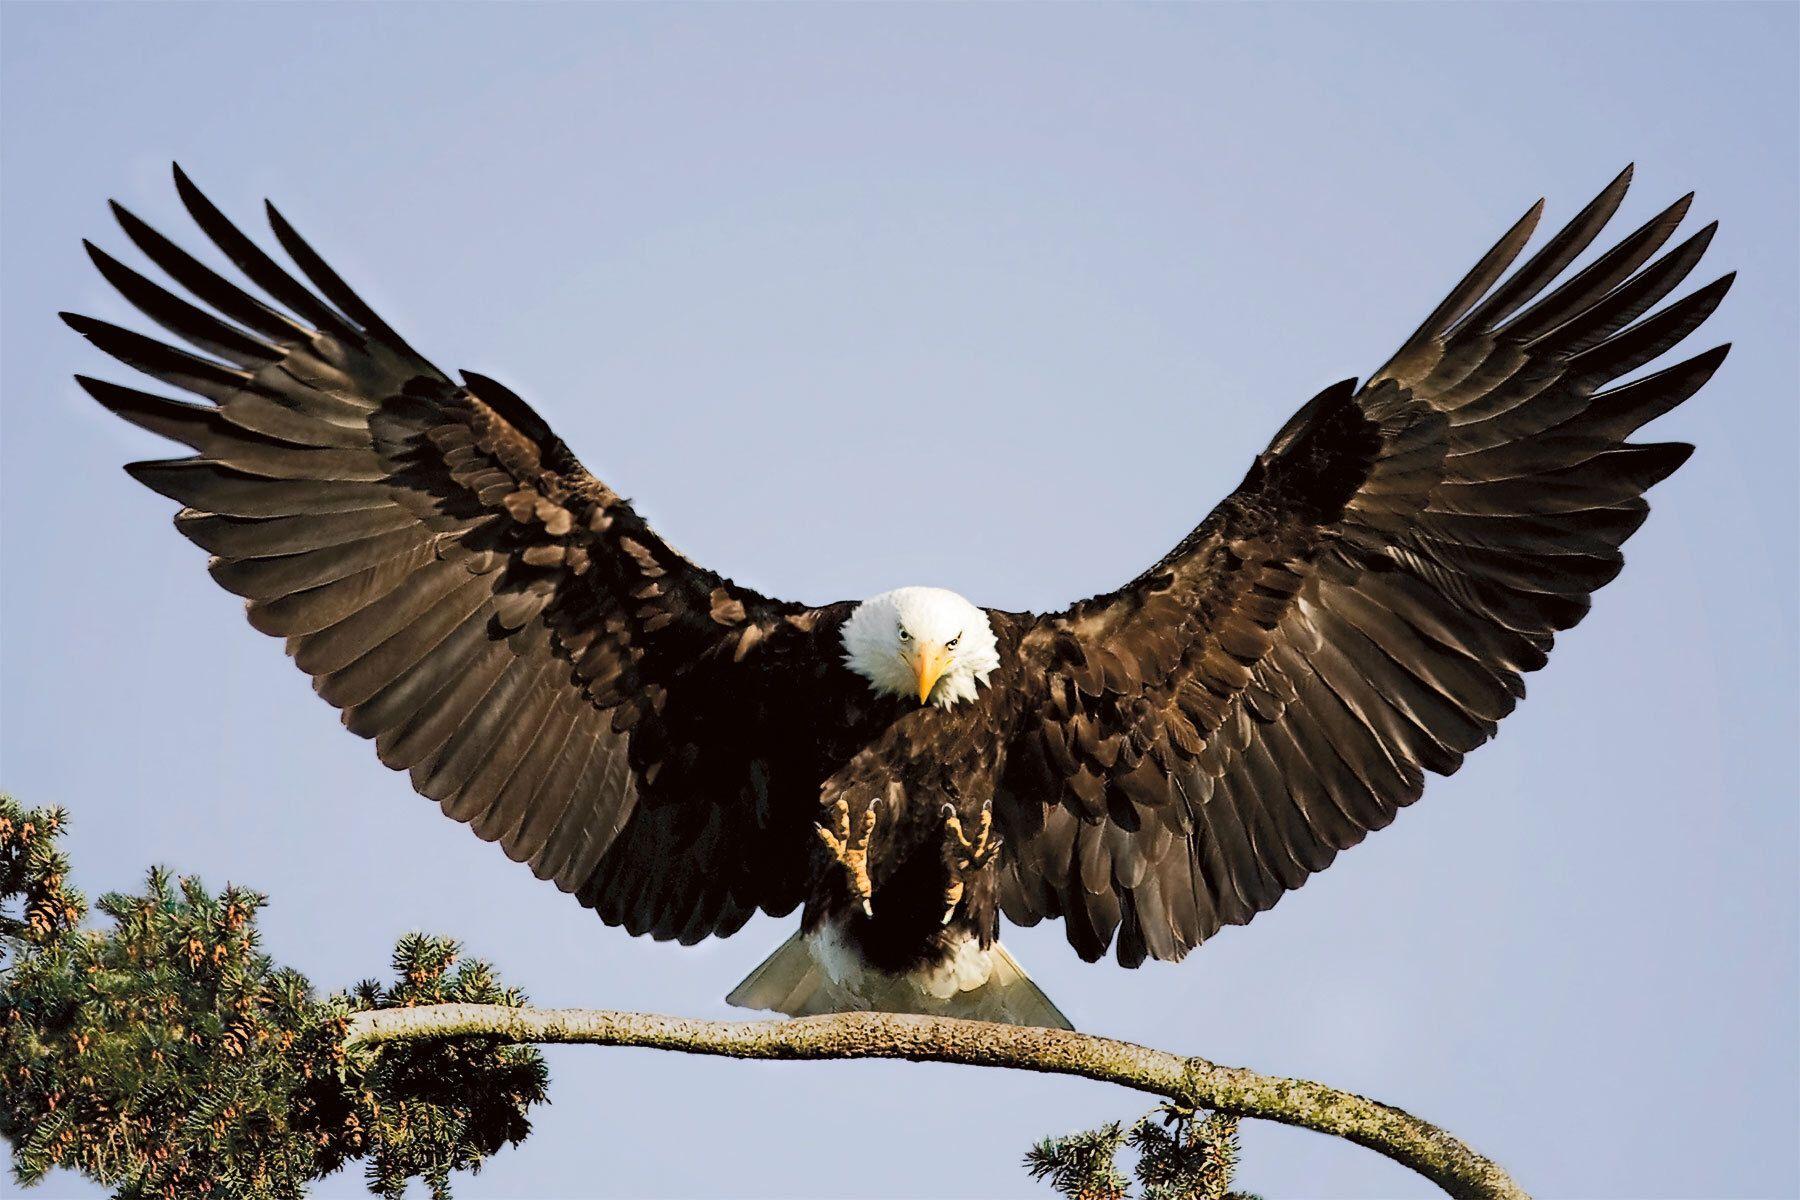 Image from http://www.cjhockett.com/data/photos/194_1spread_eagle_ ...